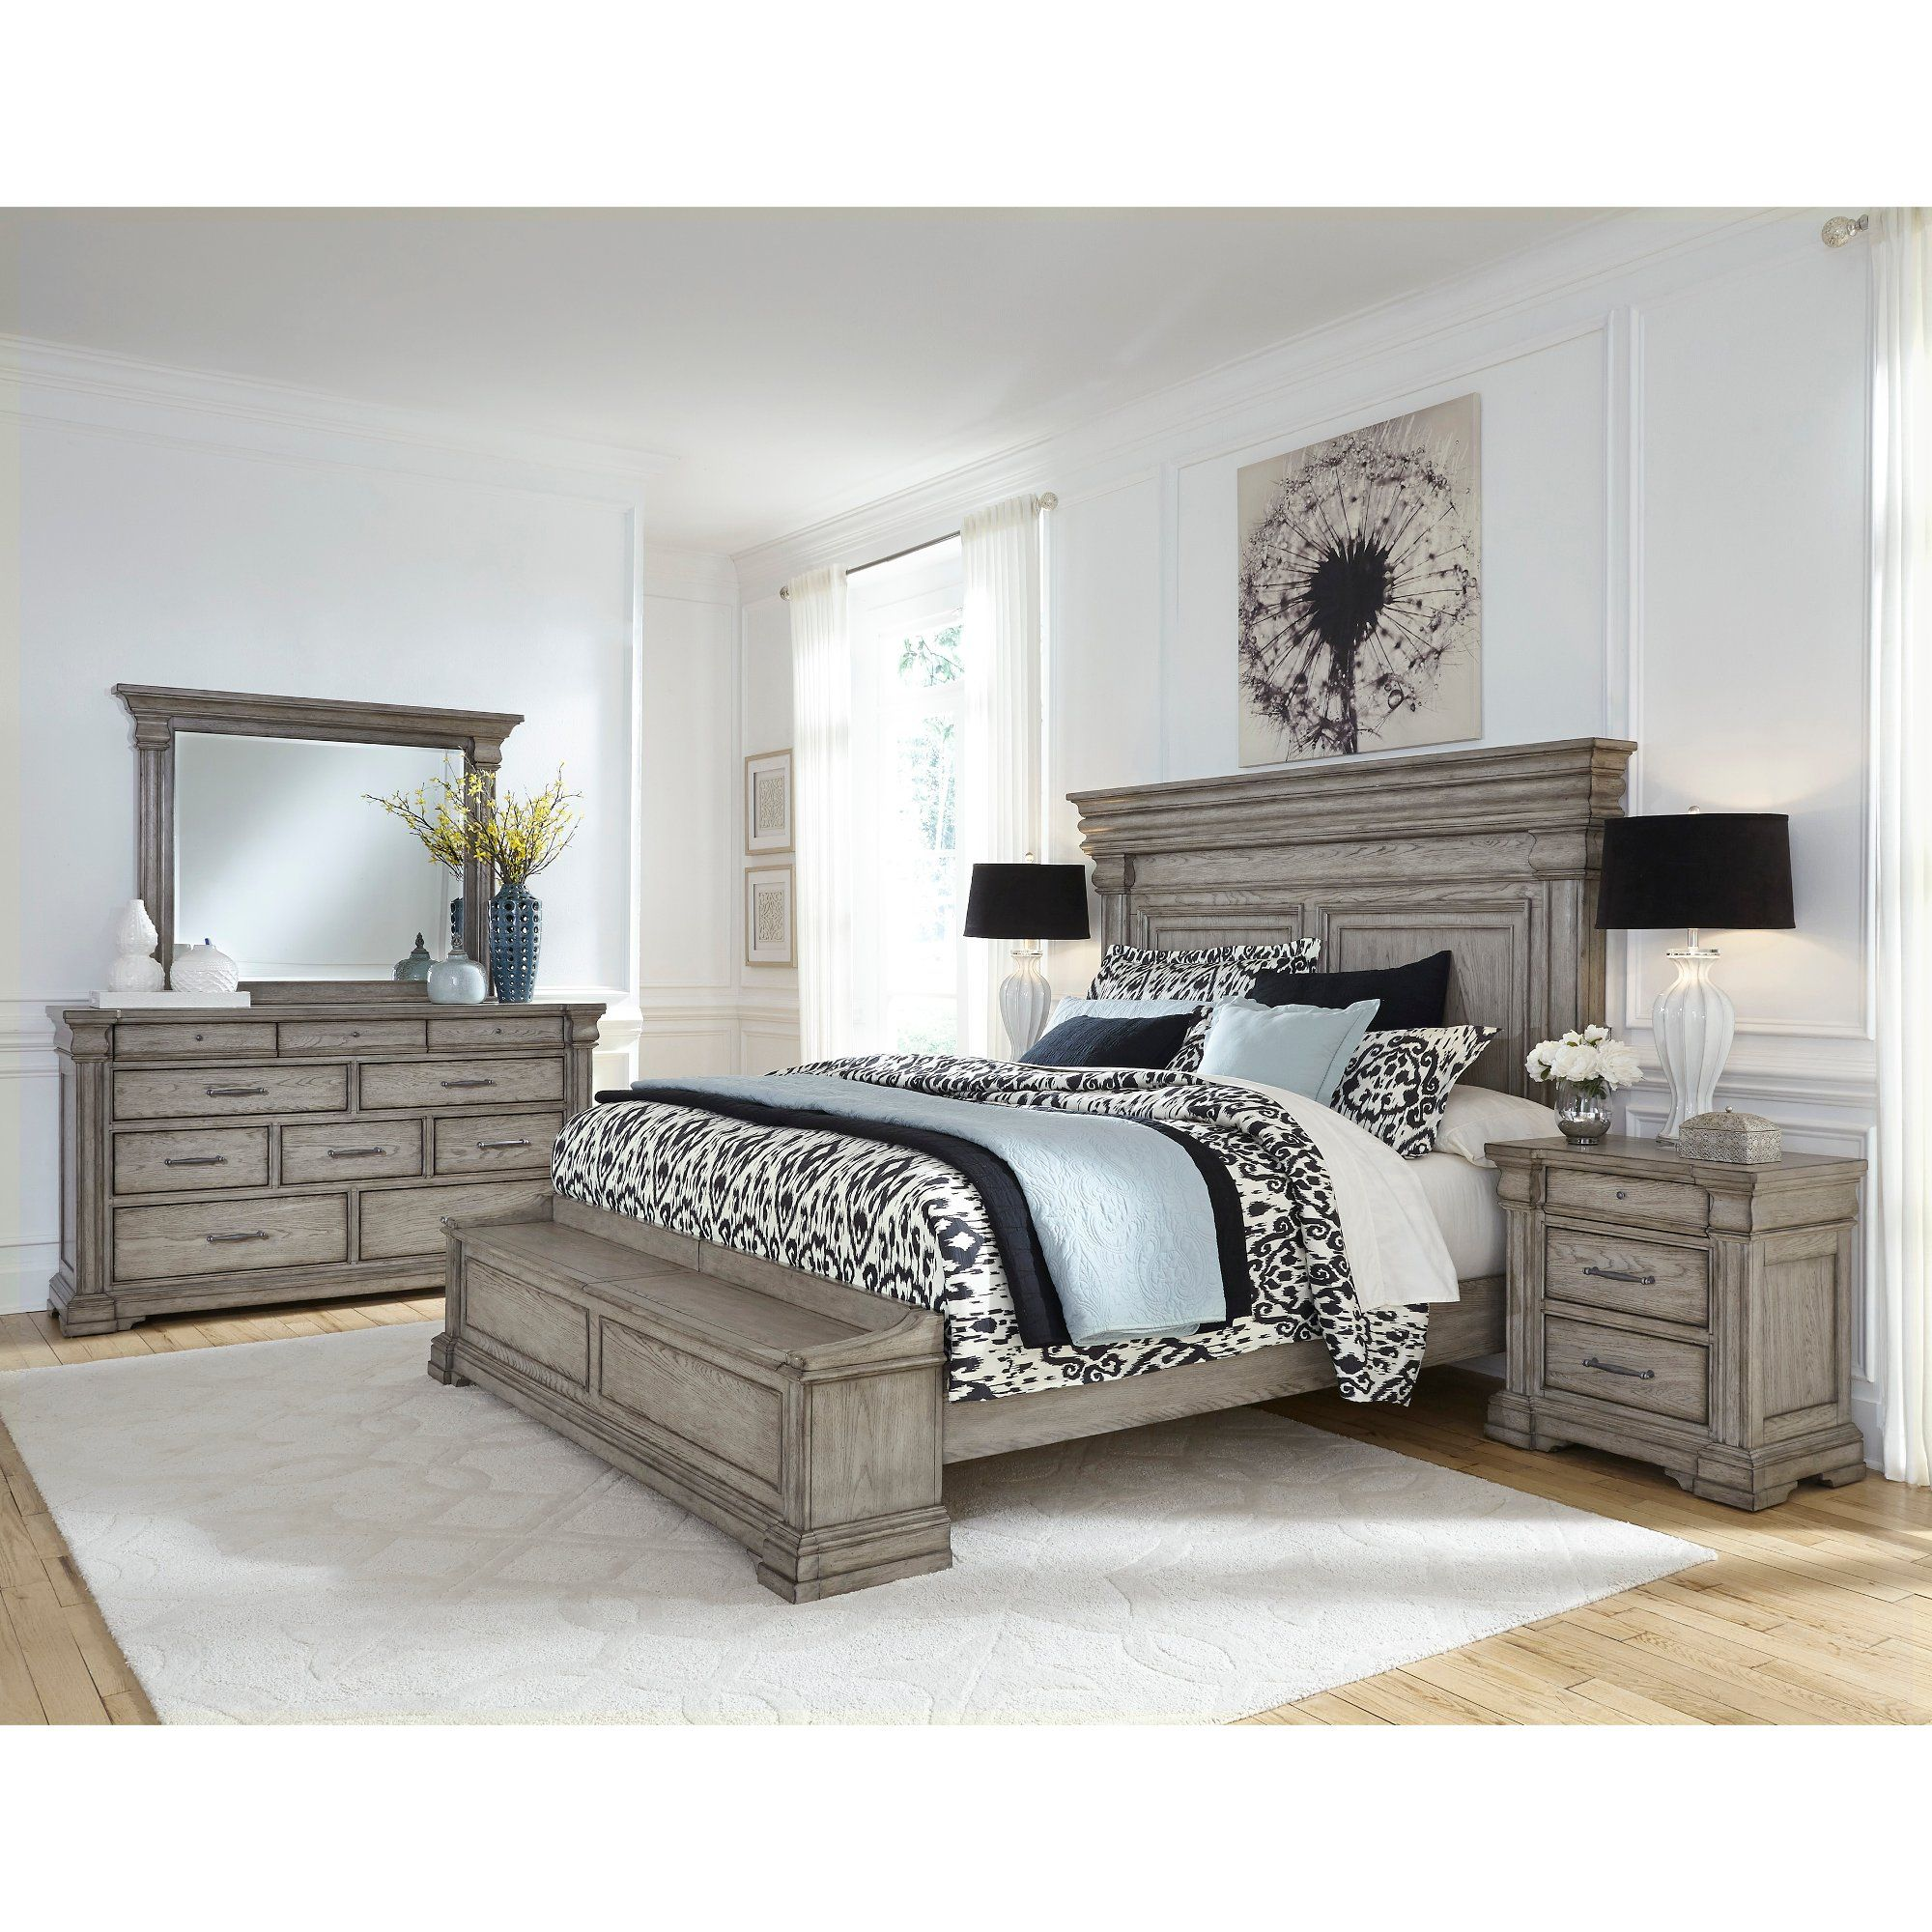 Traditional Gray 4 Piece California King Bedroom Set Madison Ridge In 2020 King Bedroom Sets Grey Bedroom Set King Size Bedroom Sets